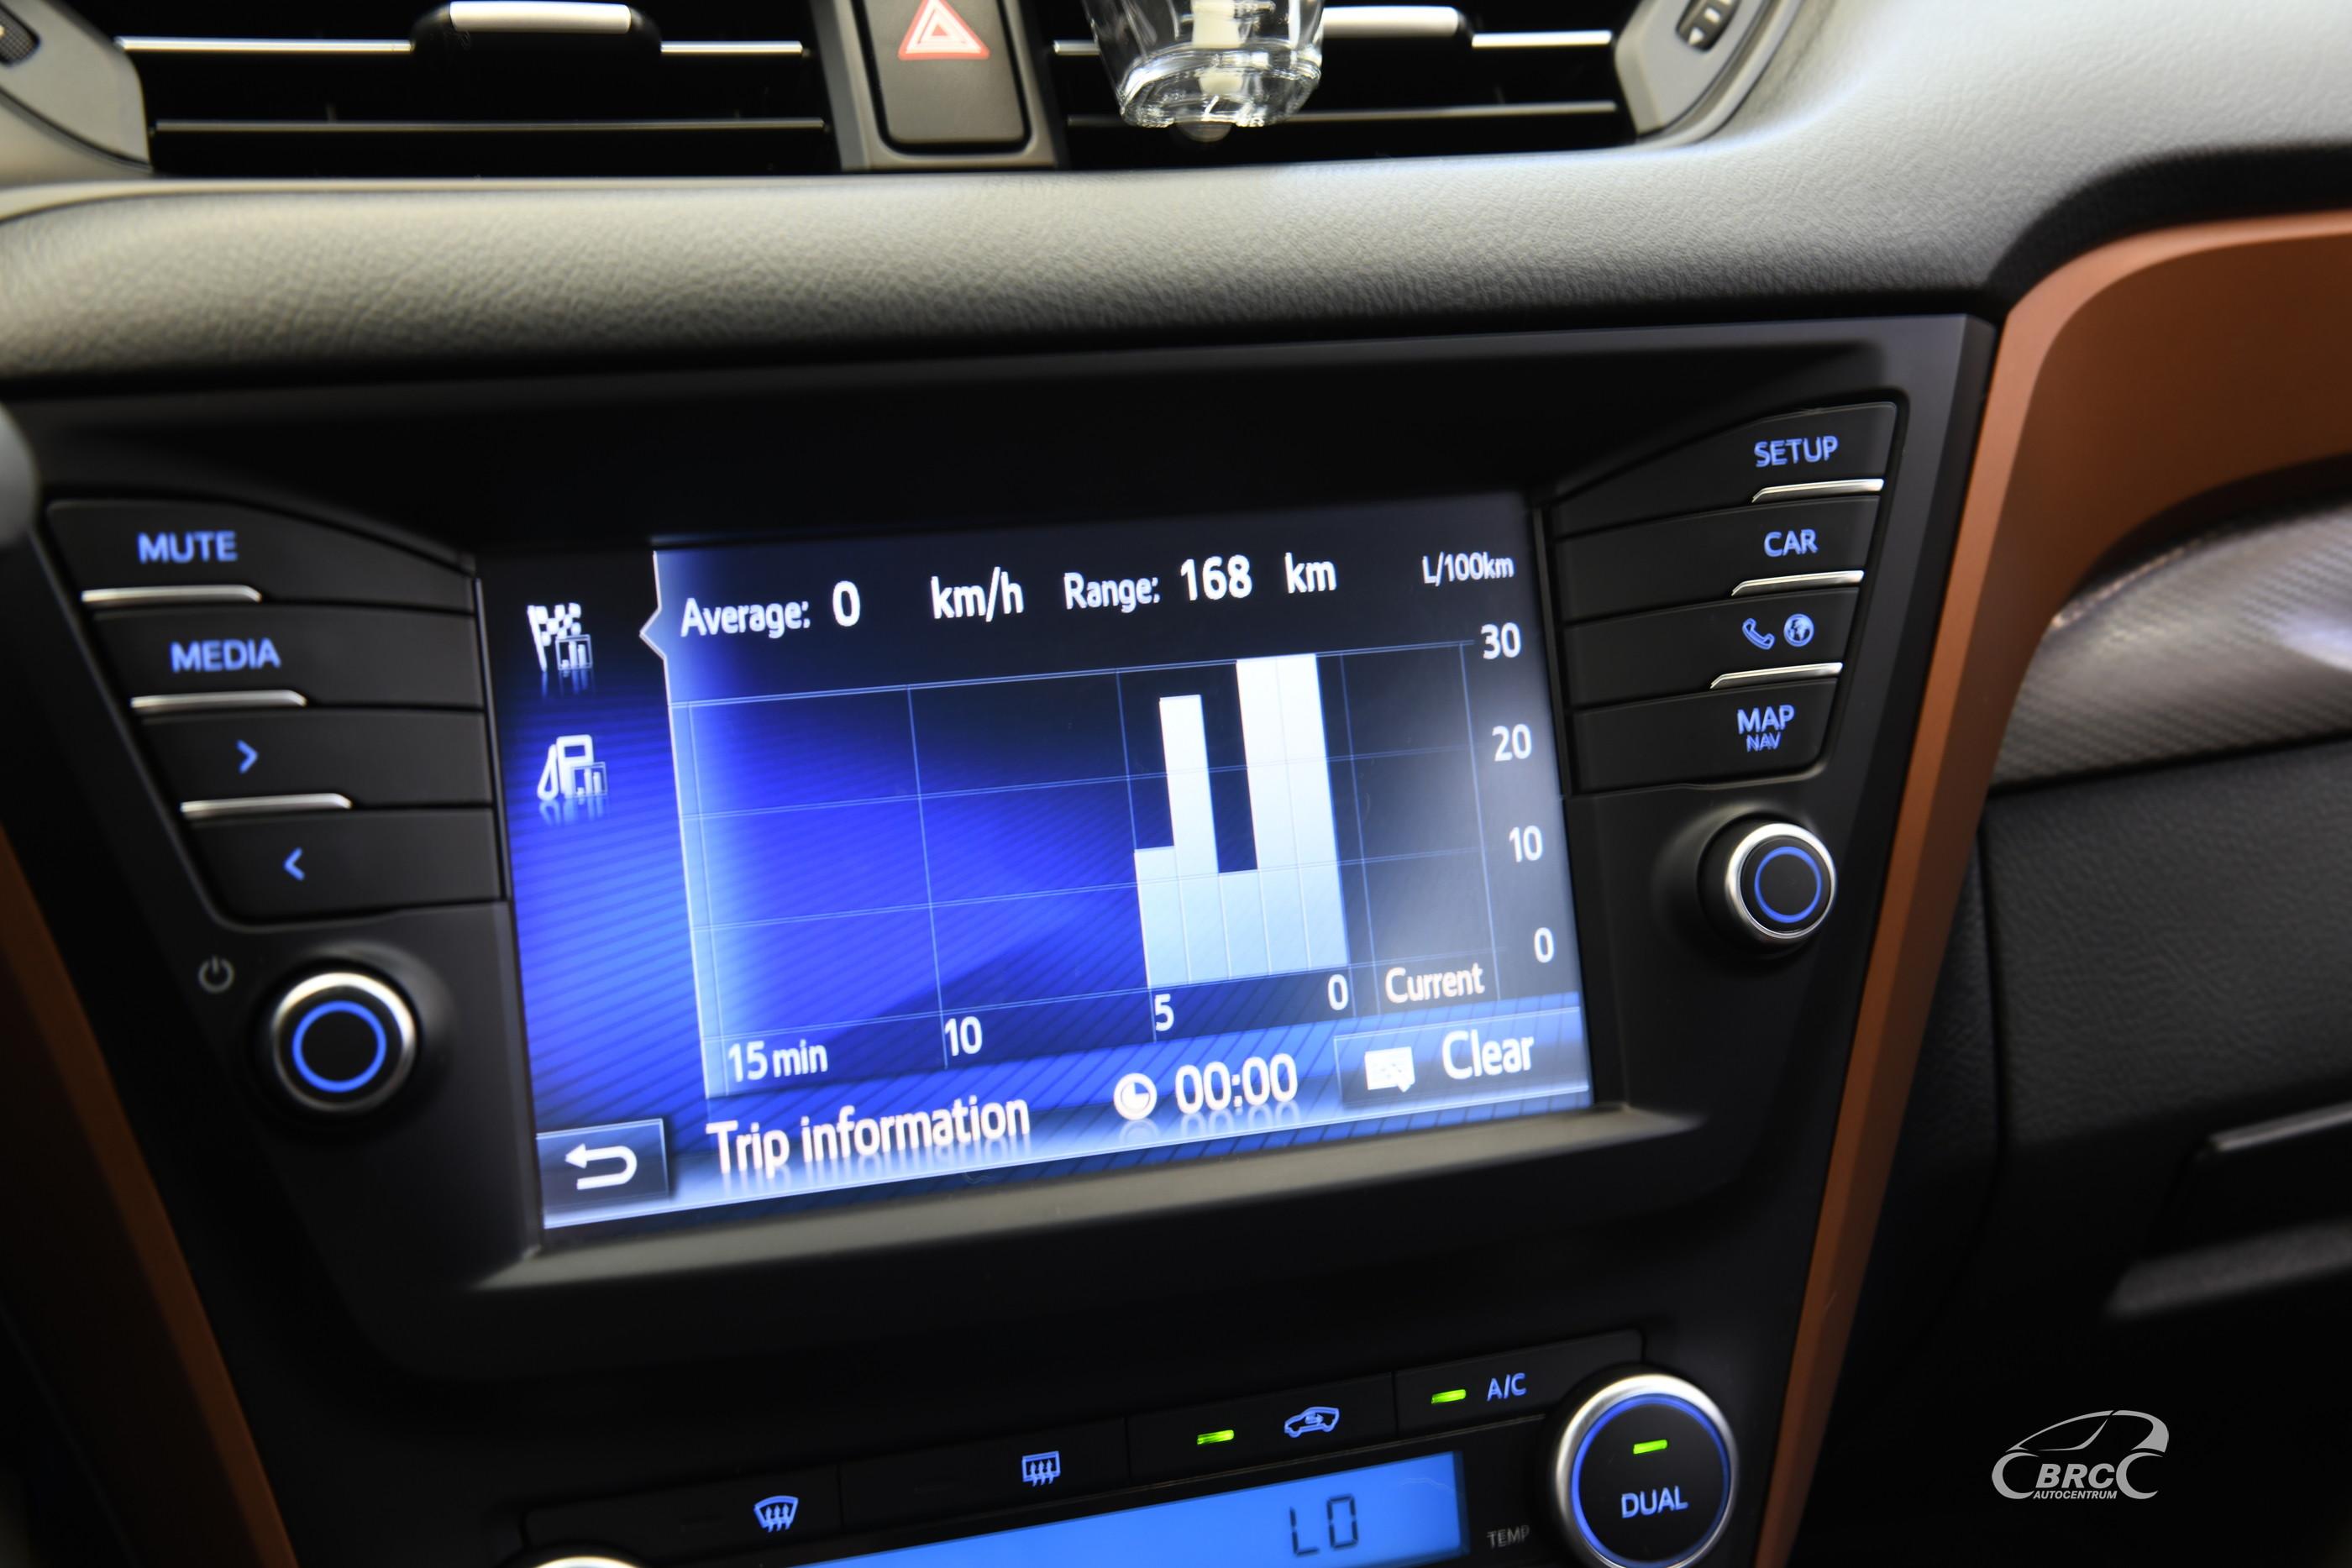 Toyota Avensis 1.8 Valvematic Active